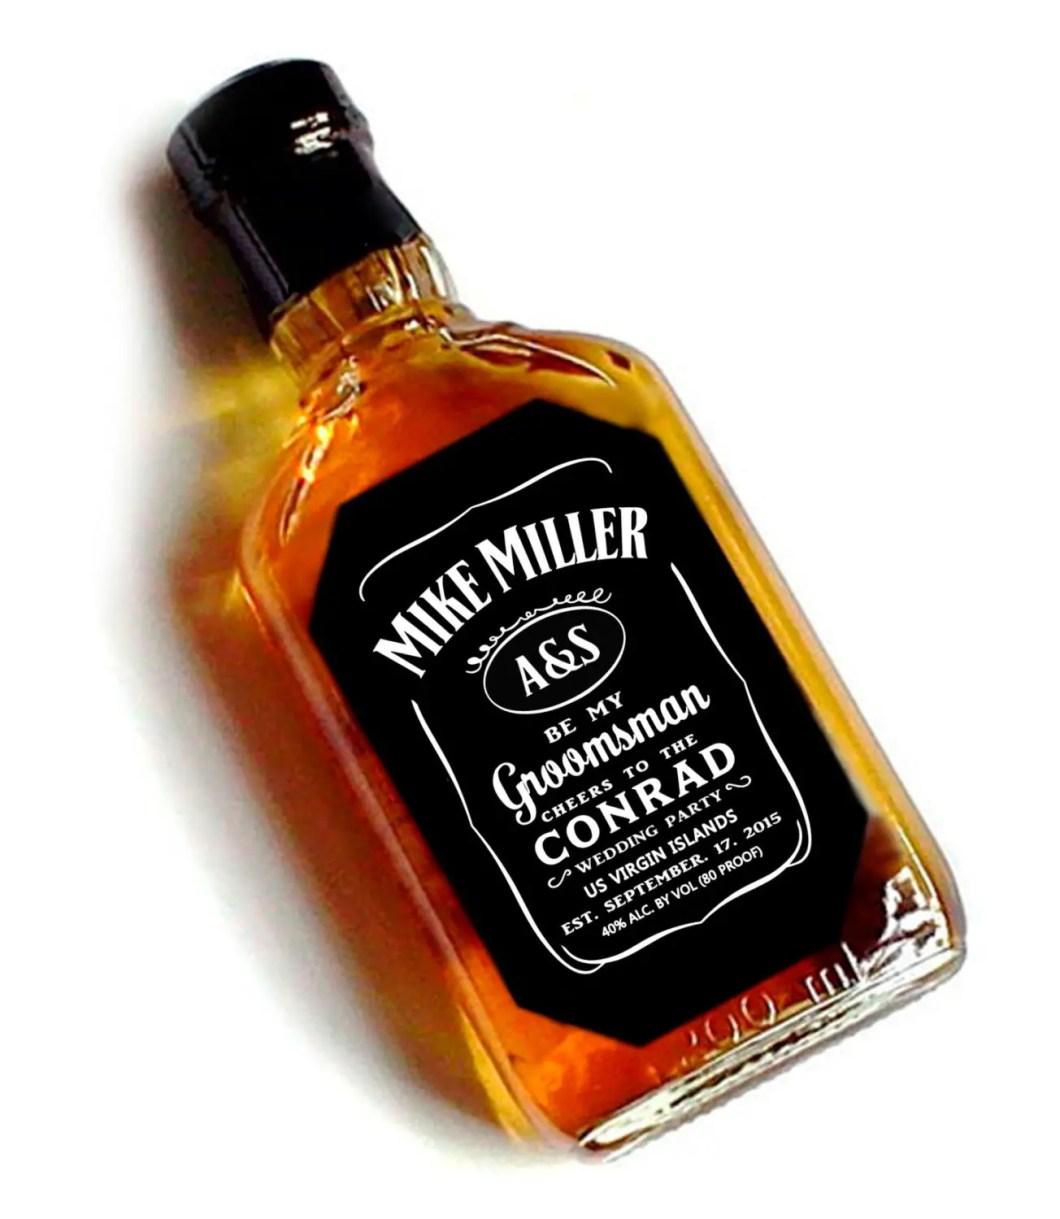 whiskey label be my groomsman